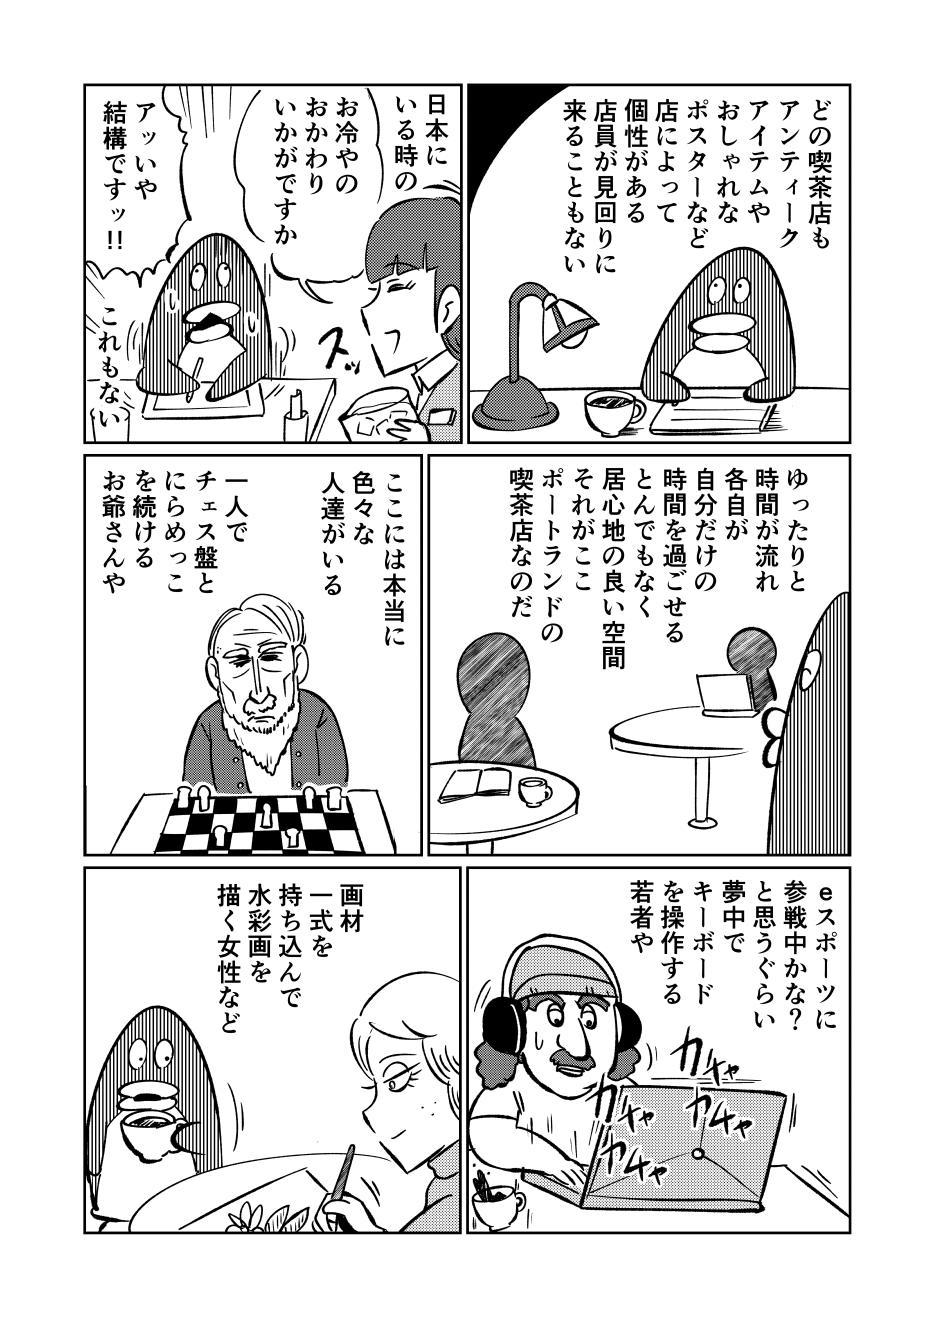 https://www.ryugaku.co.jp/blog/els_portland/upload/881e904122dc0a7ff23b5c4efbd3a488aaee9303.jpg